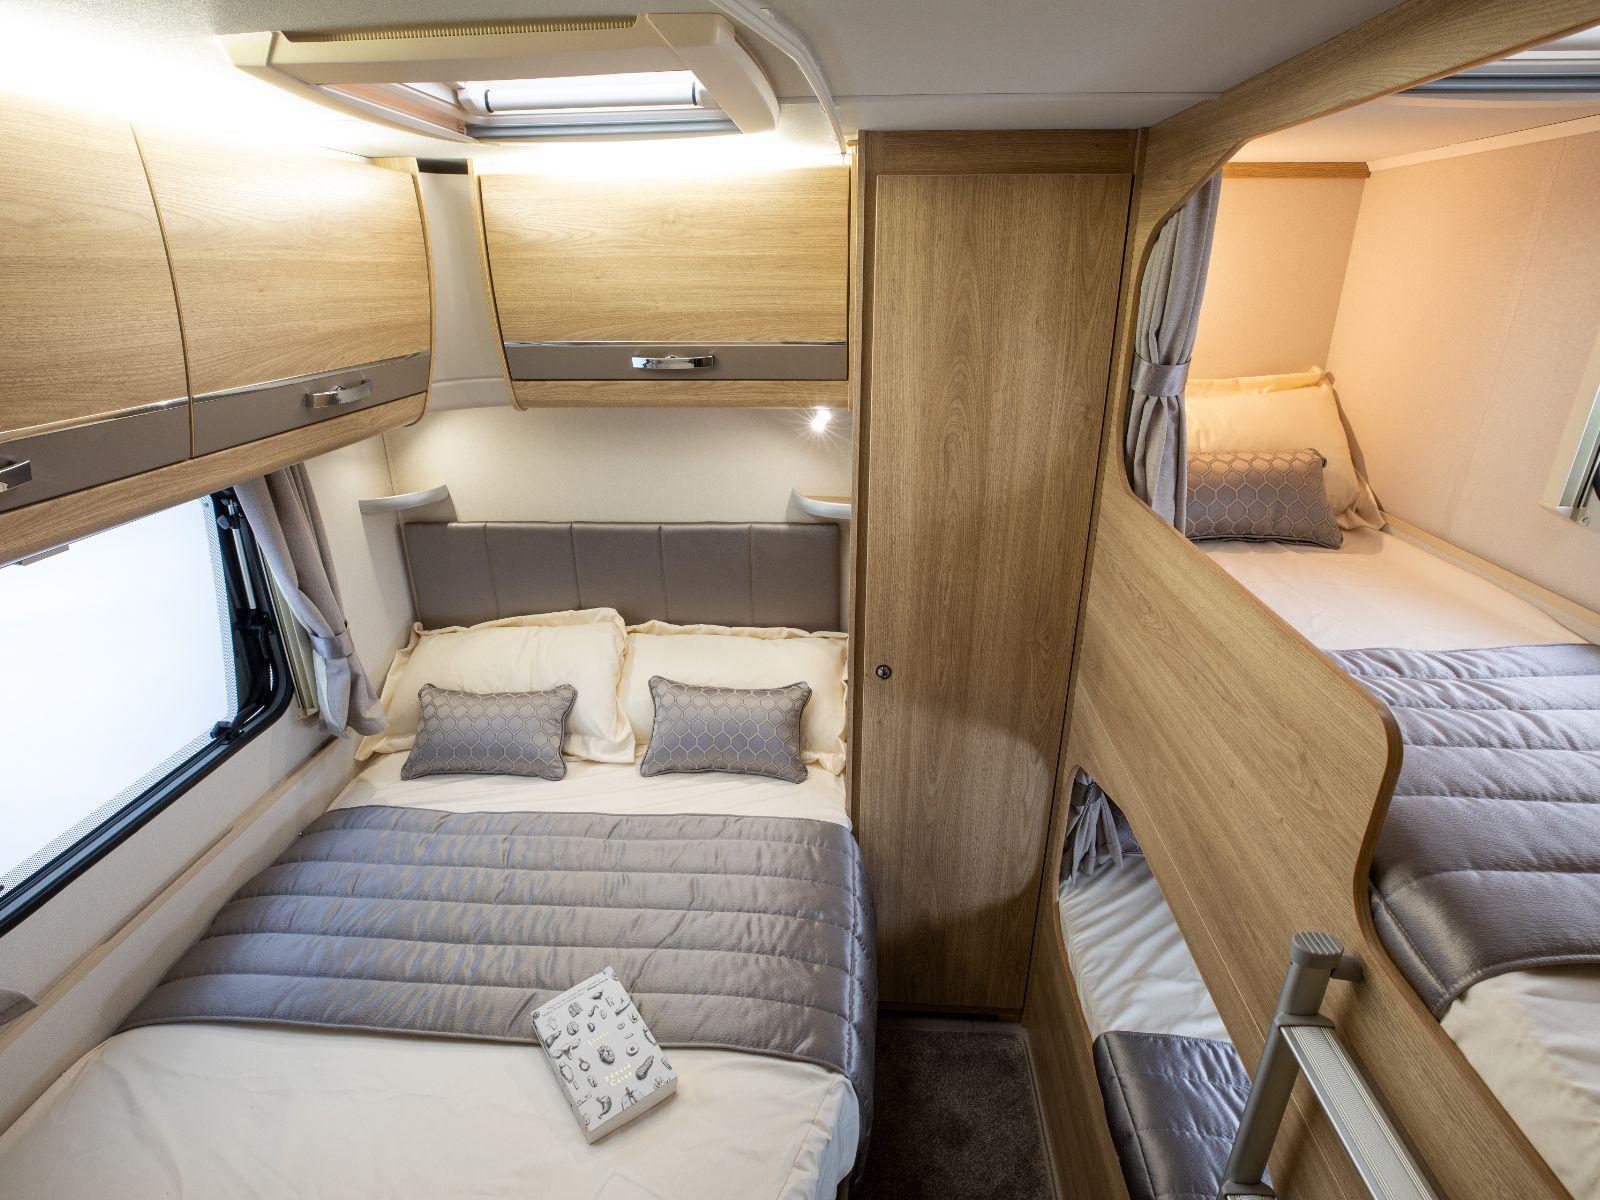 Avante 868 - 6 Berth Caravan | Avante Caravan Range